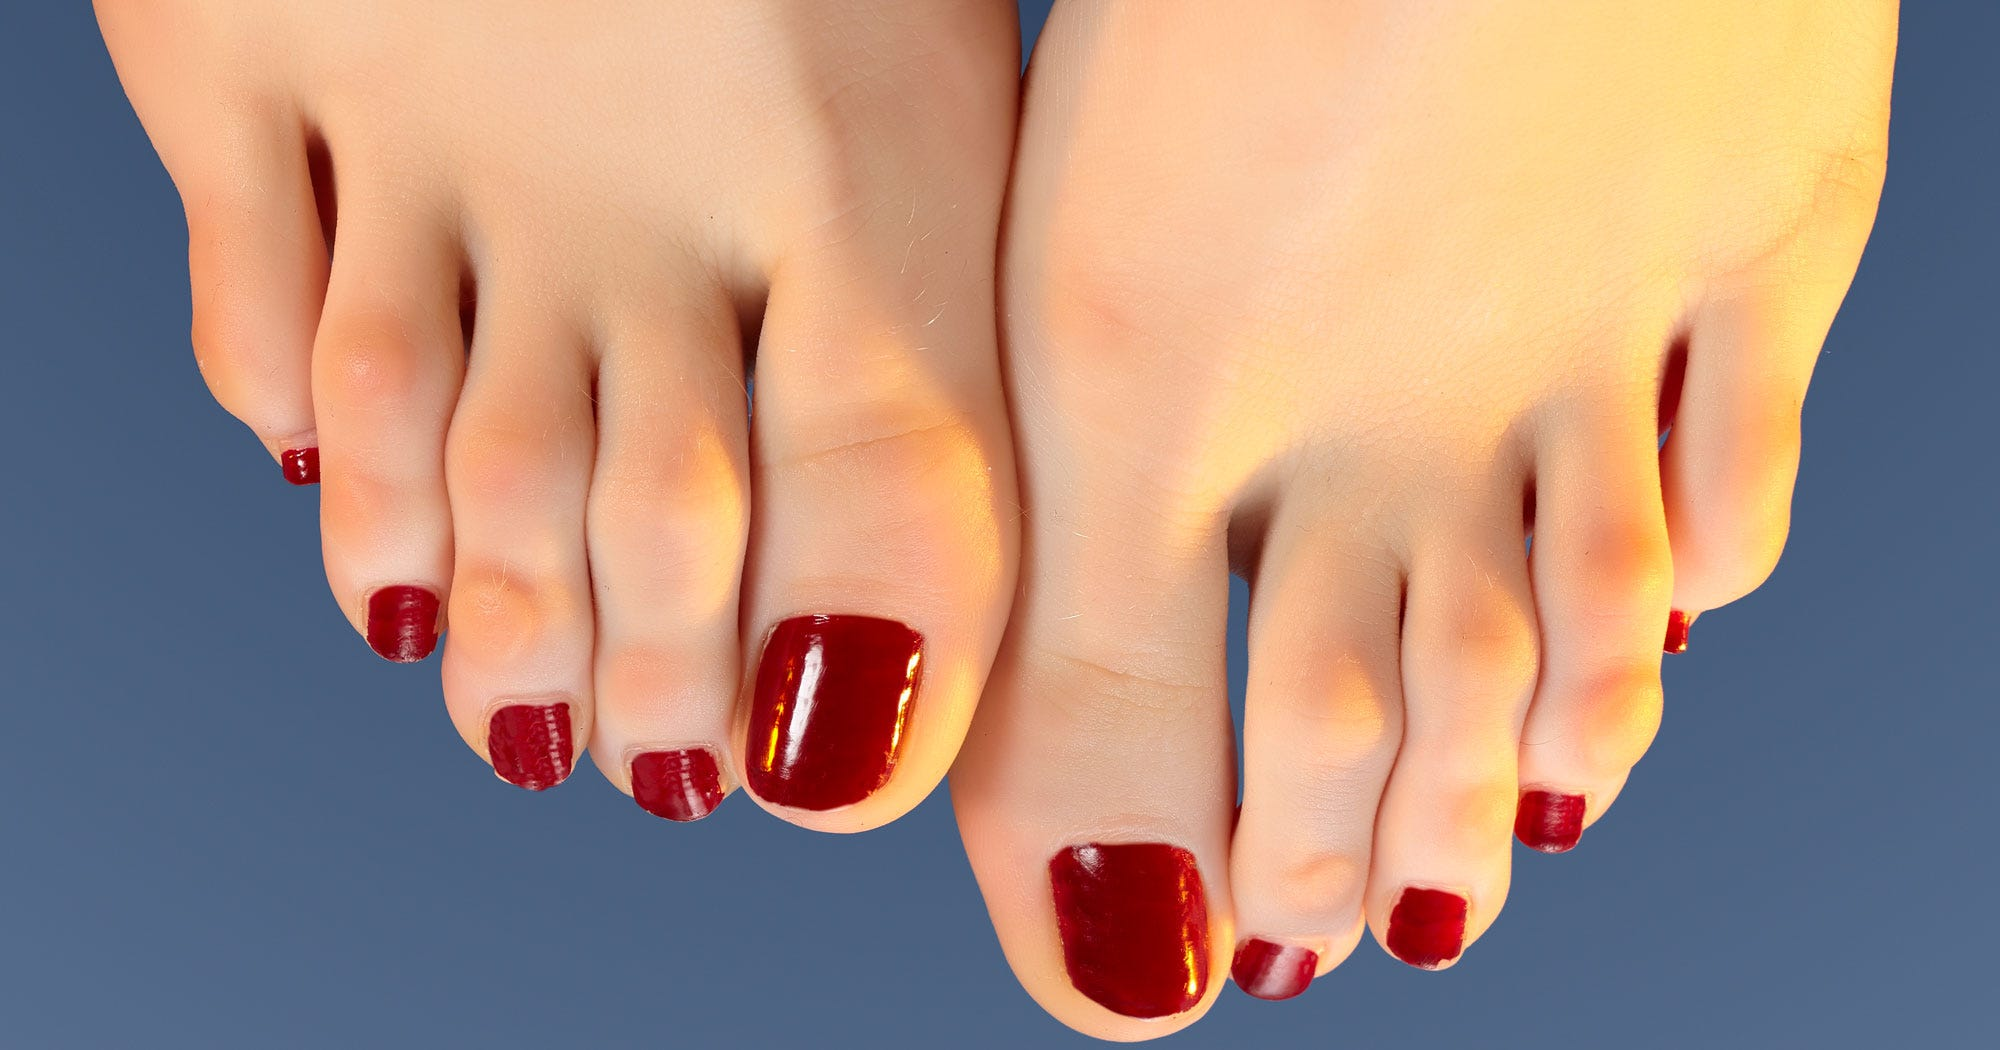 Foot fetish porm-3873